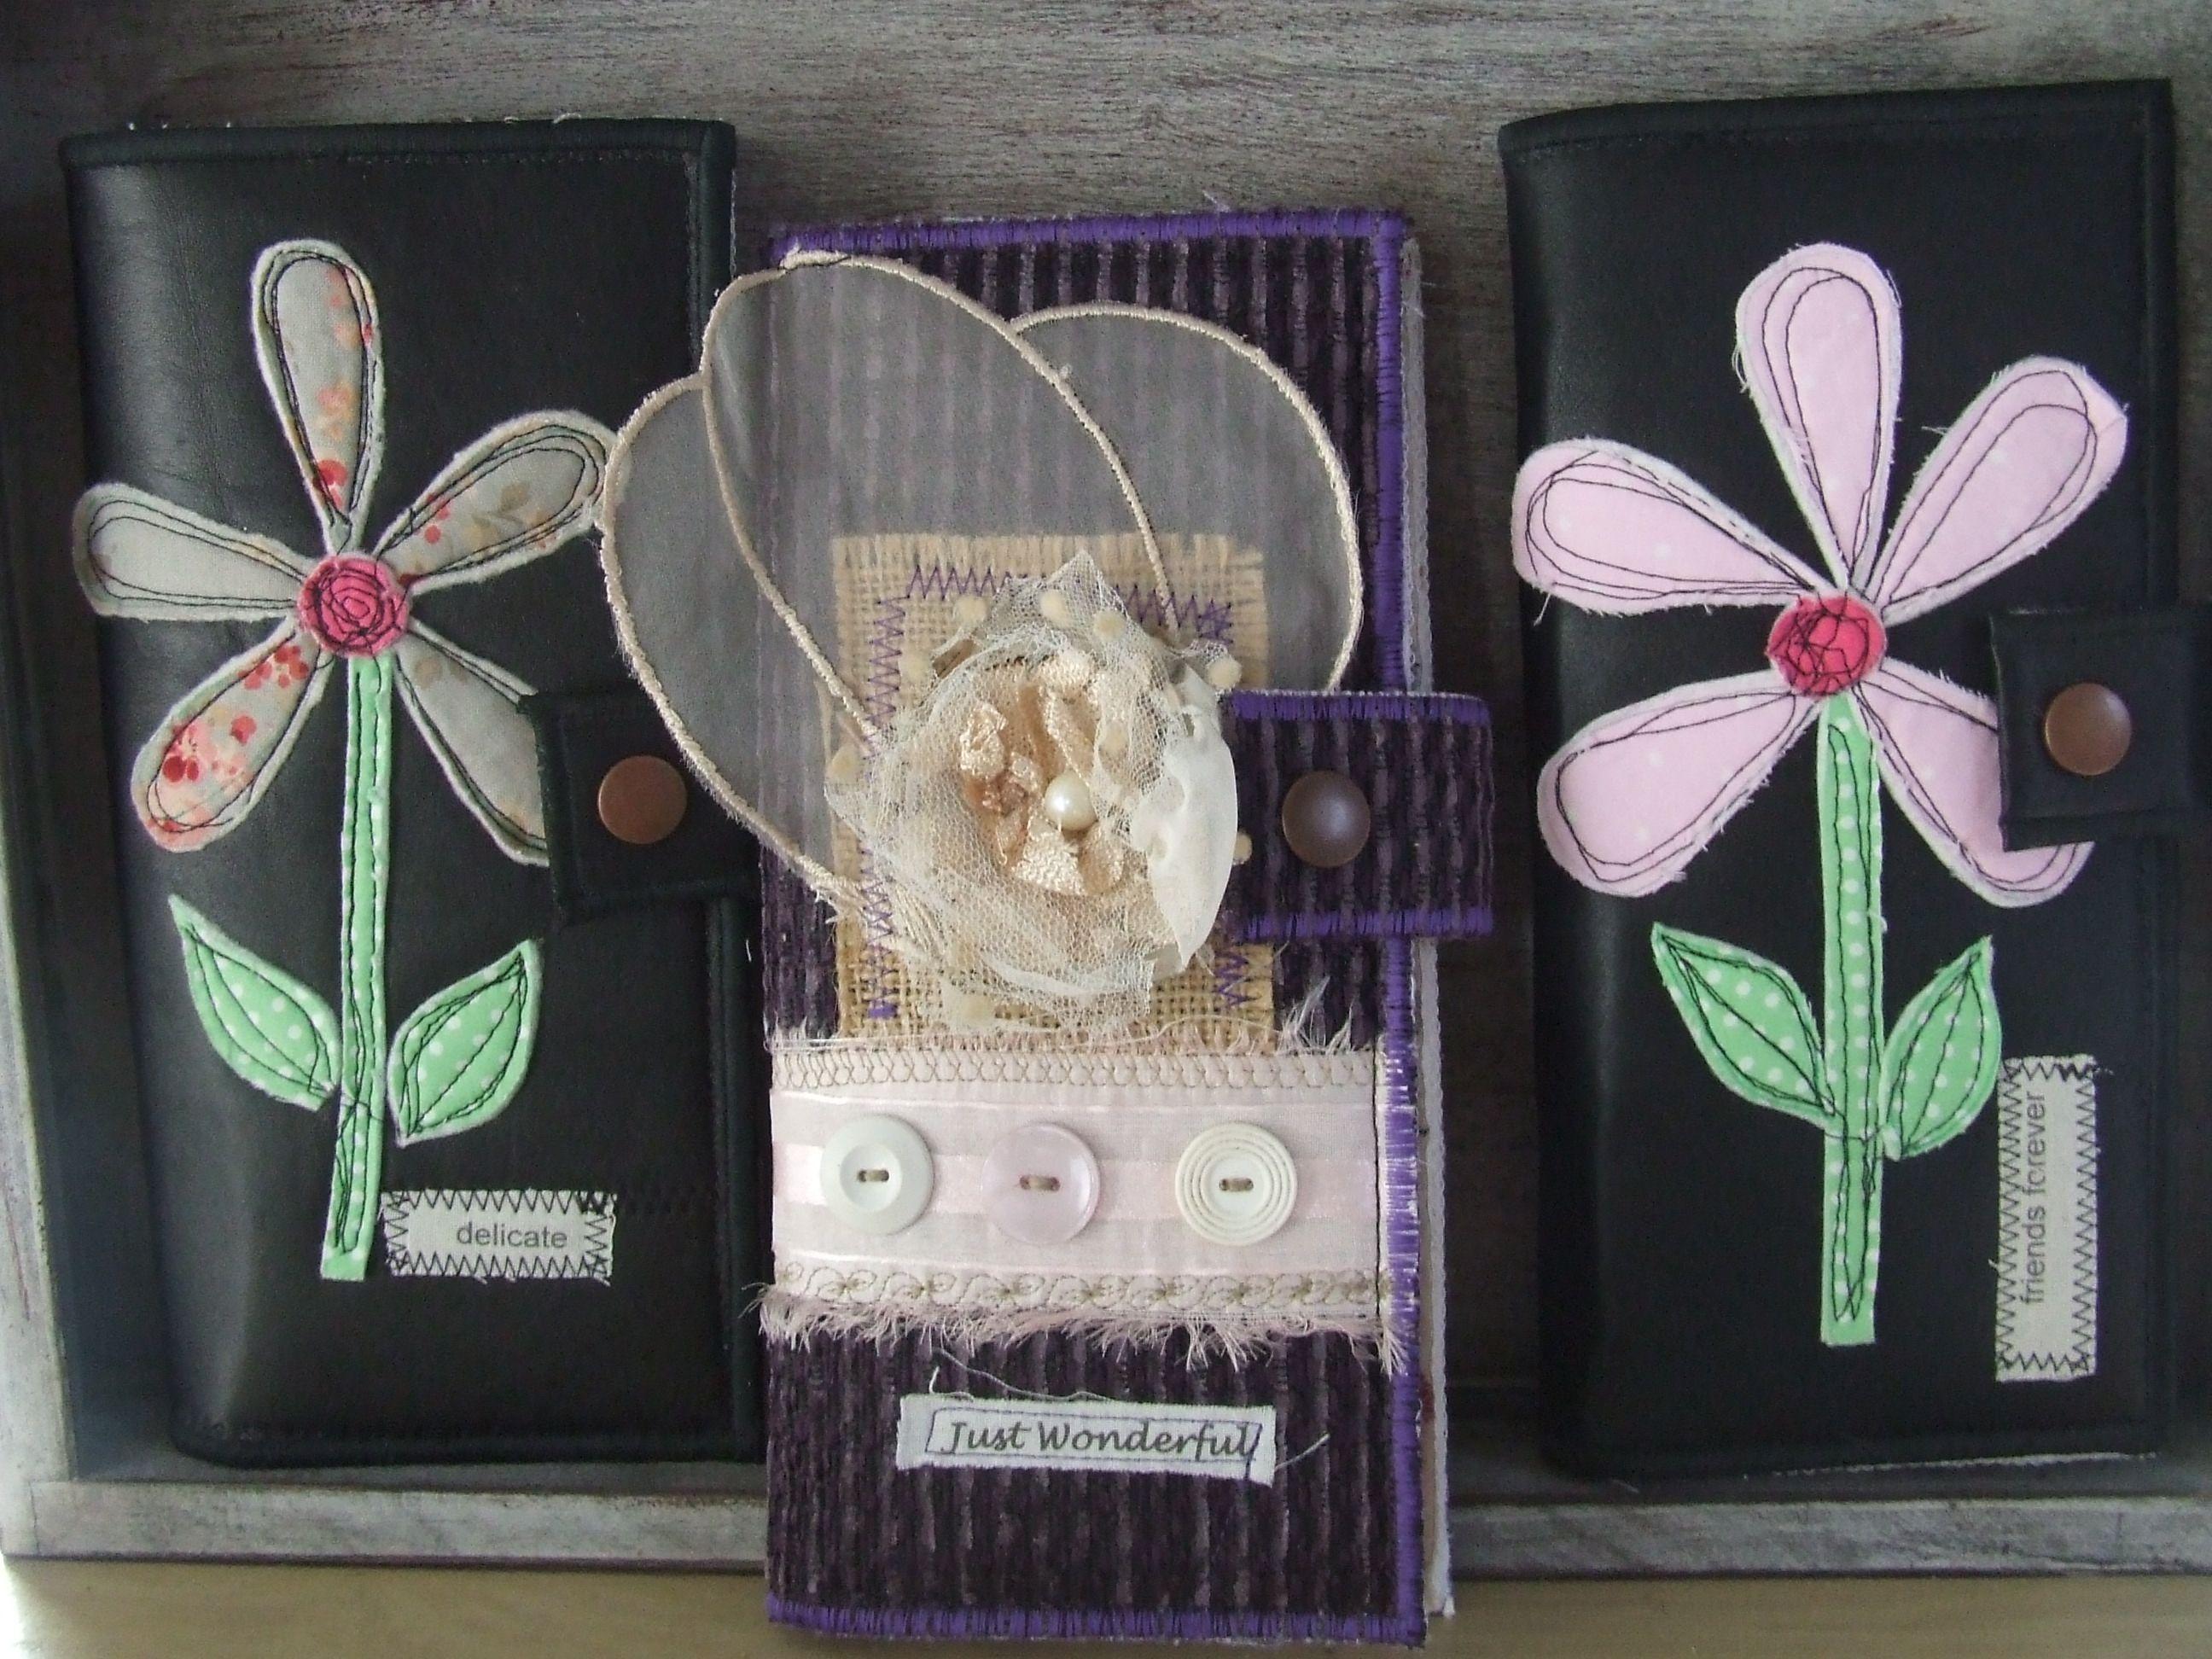 Handmade ladies wallets by lilynpearls.com